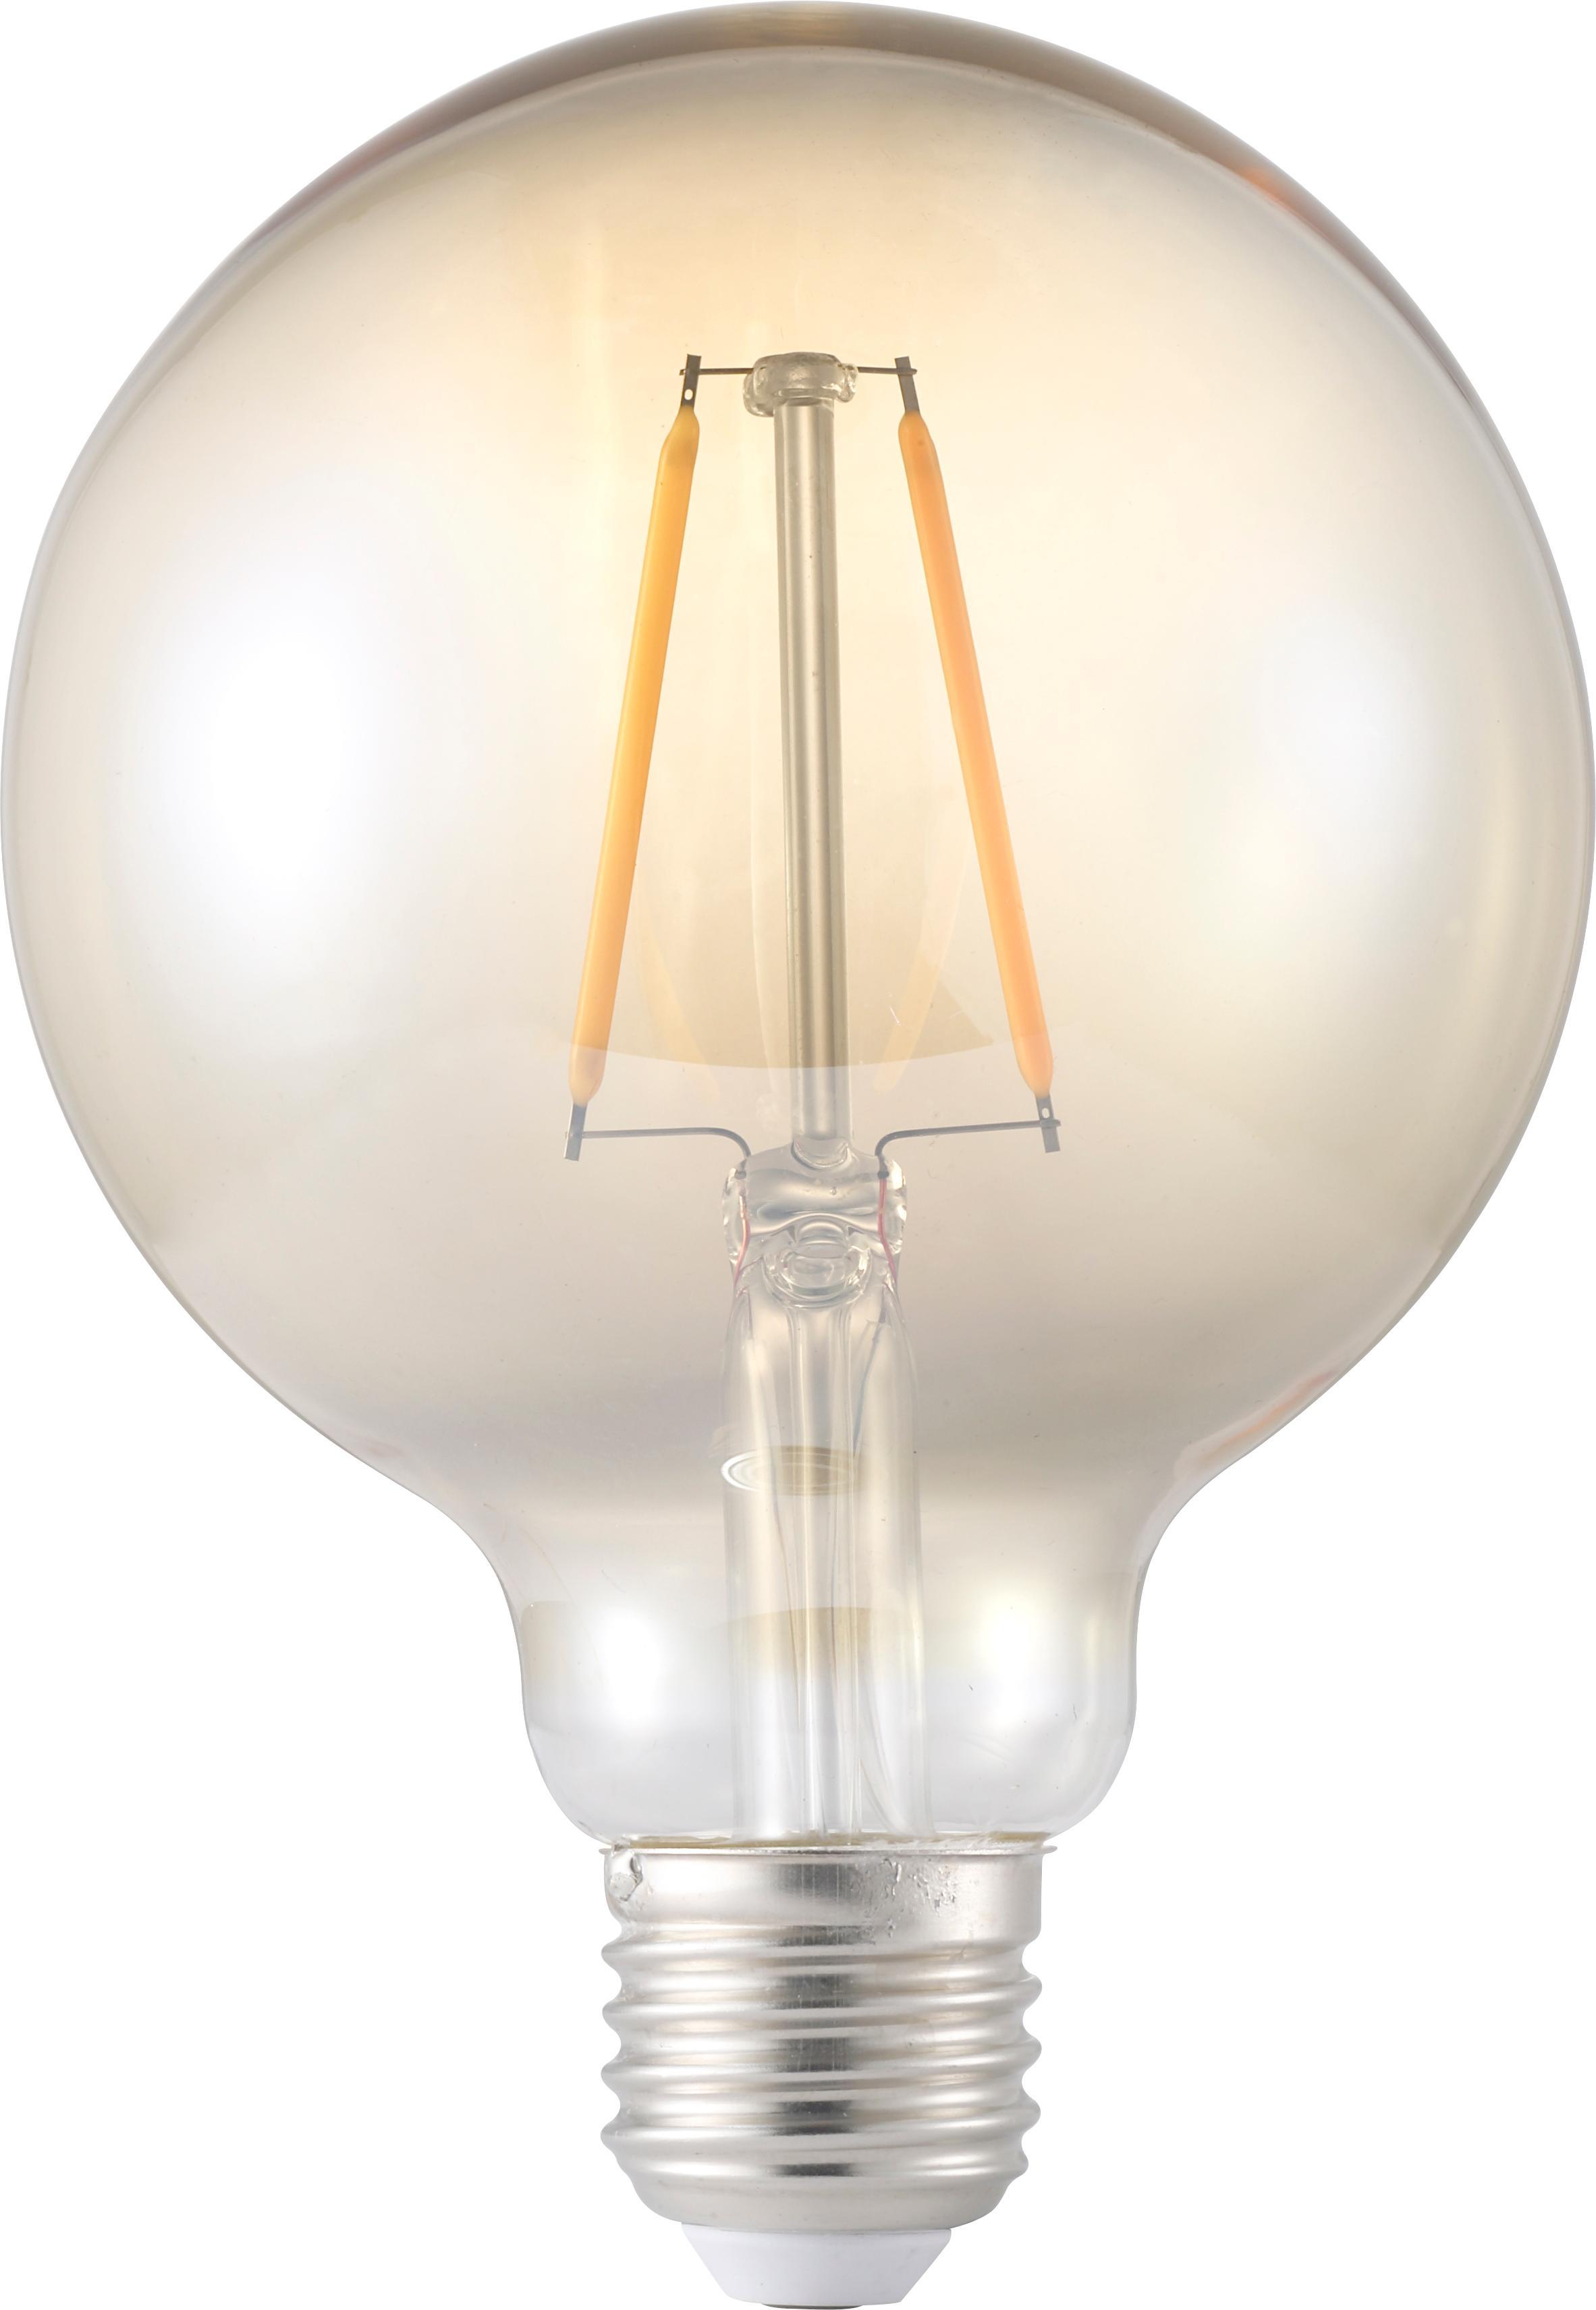 Lampadina a LED Rash (E27 / 1,2Watt), Lampadina: vetro, Ambra, Ø 10 x Alt. 14 cm